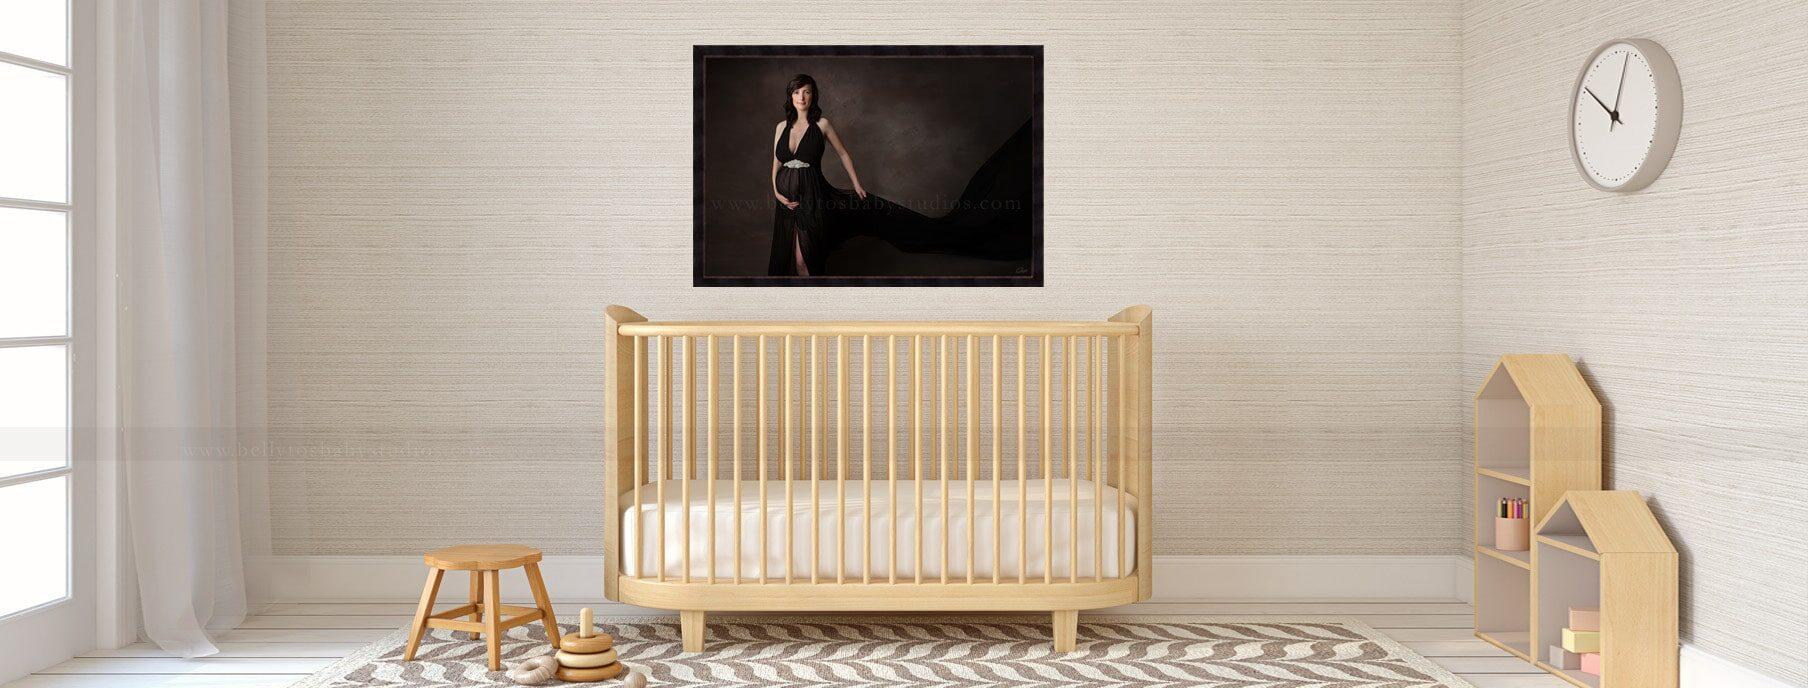 Maternity Photoshoot in Houston